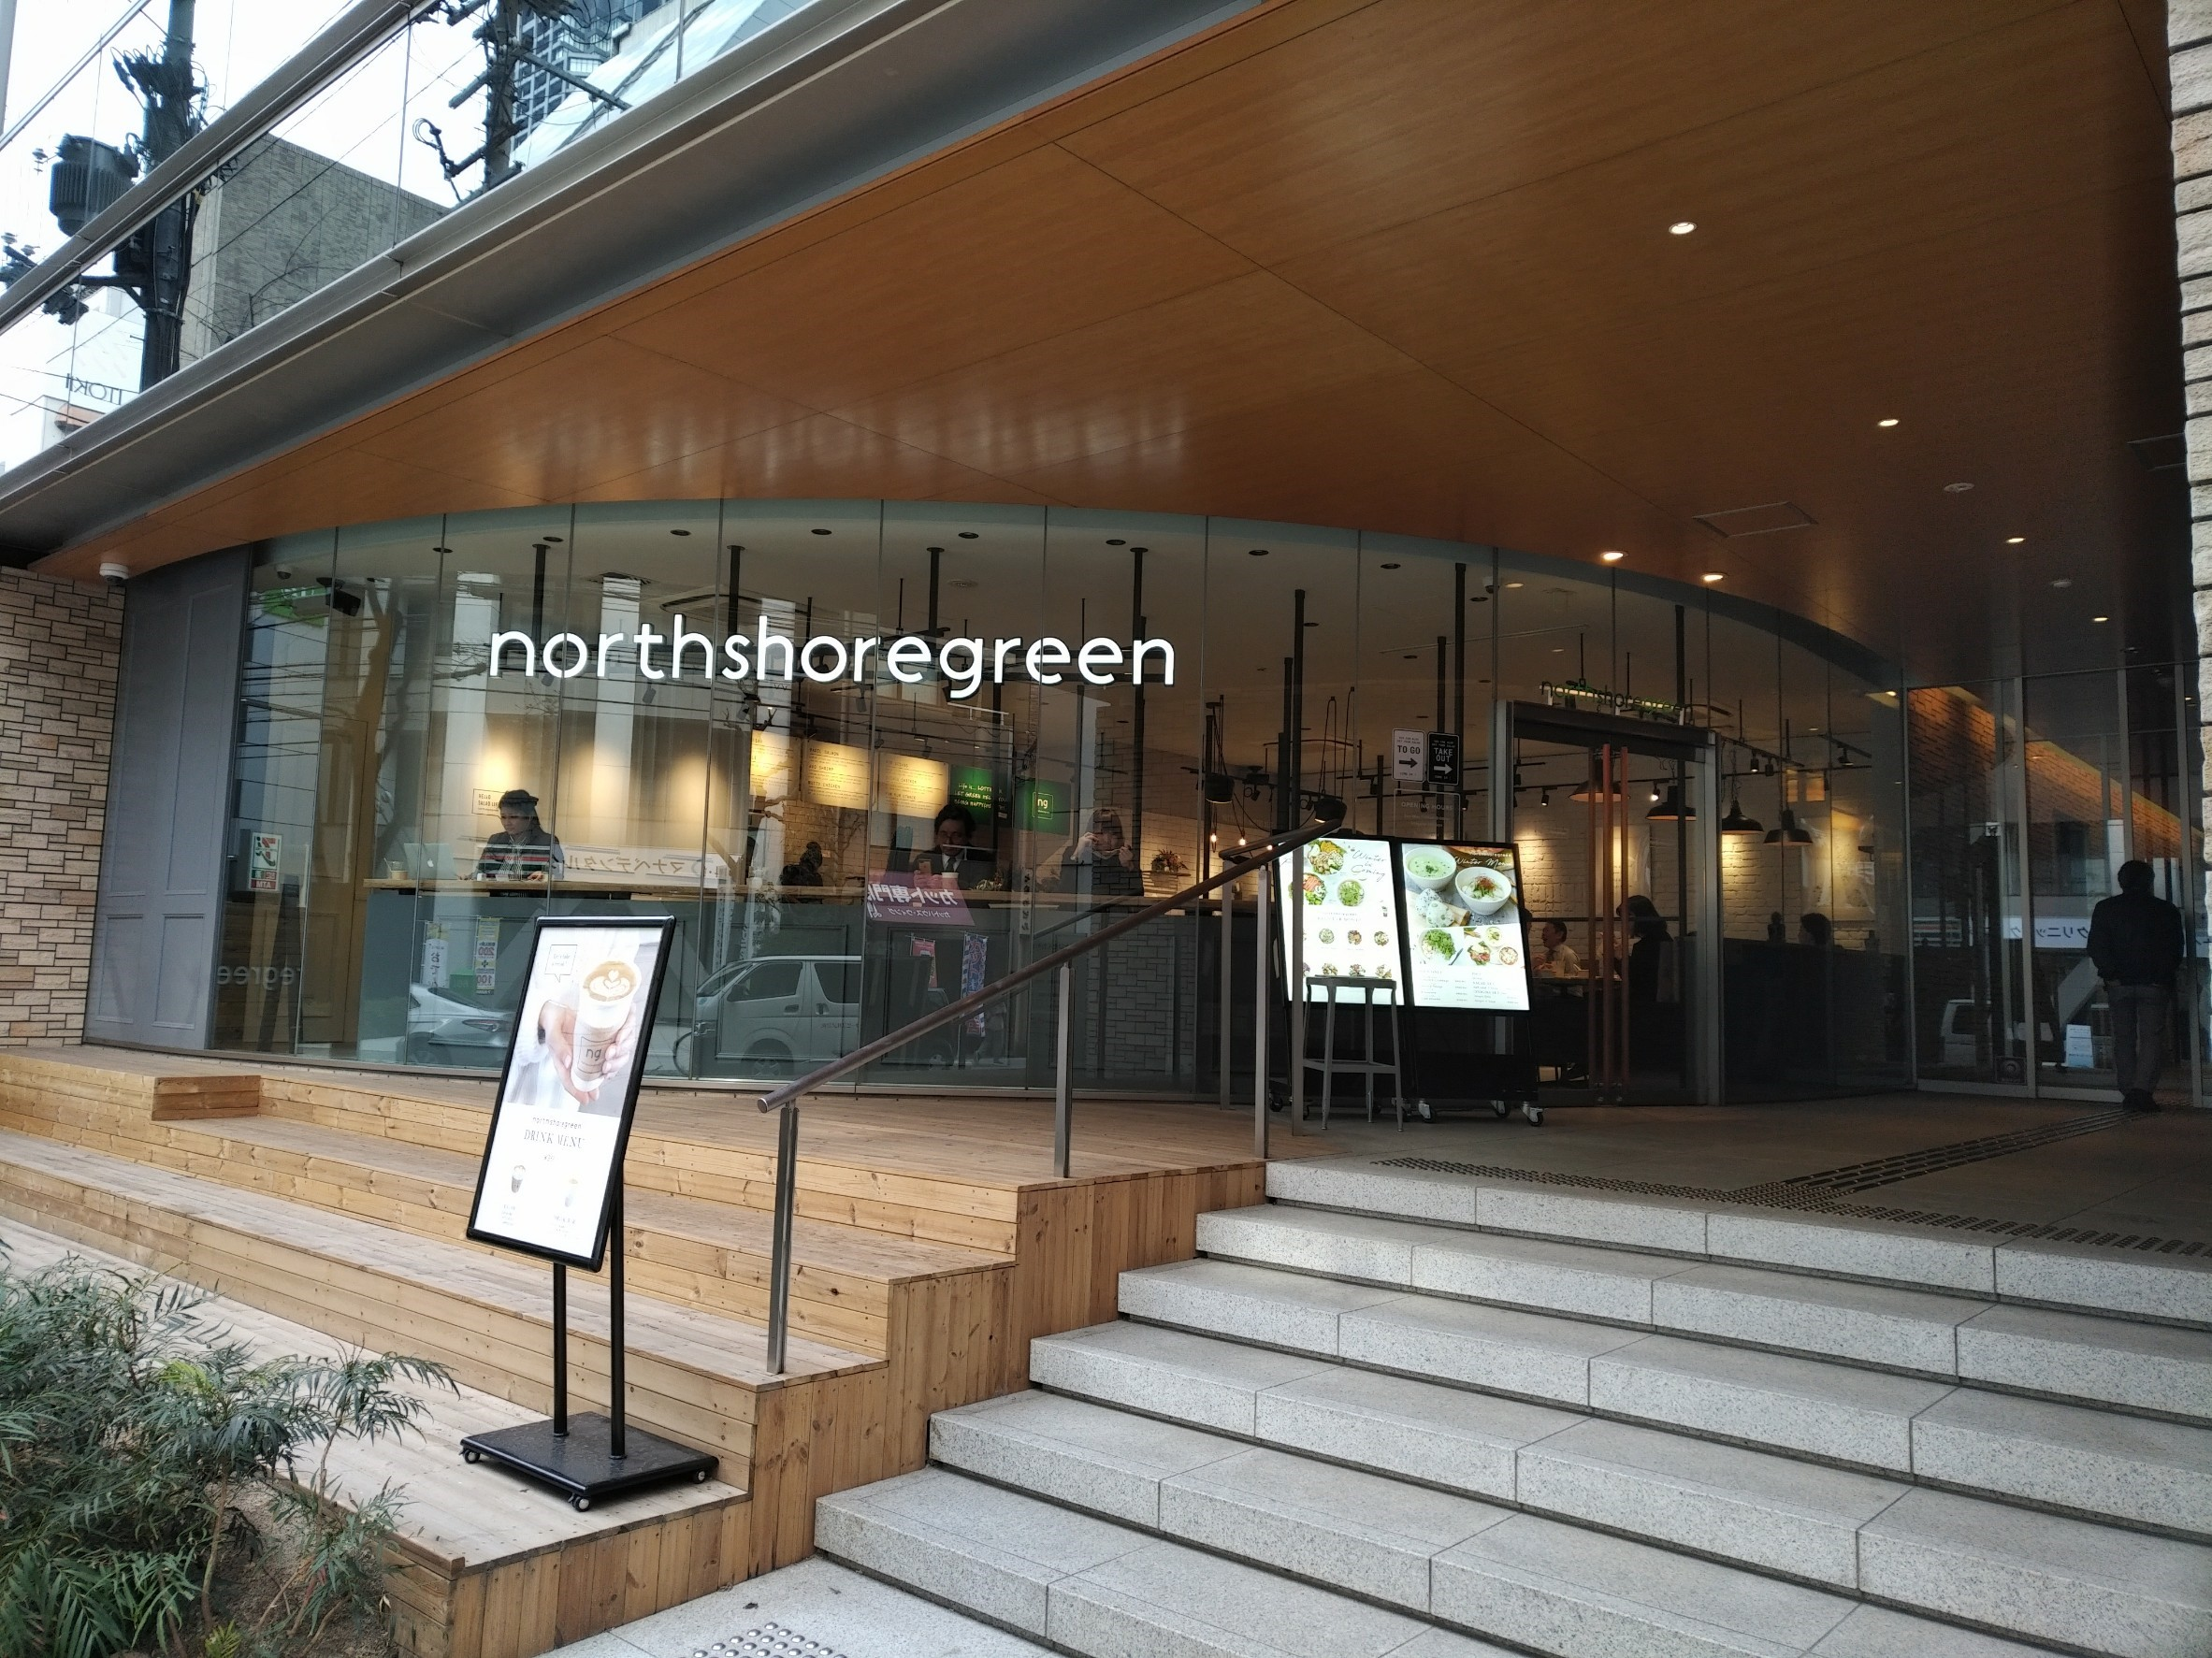 northshoregreen - ノースショアグリーン